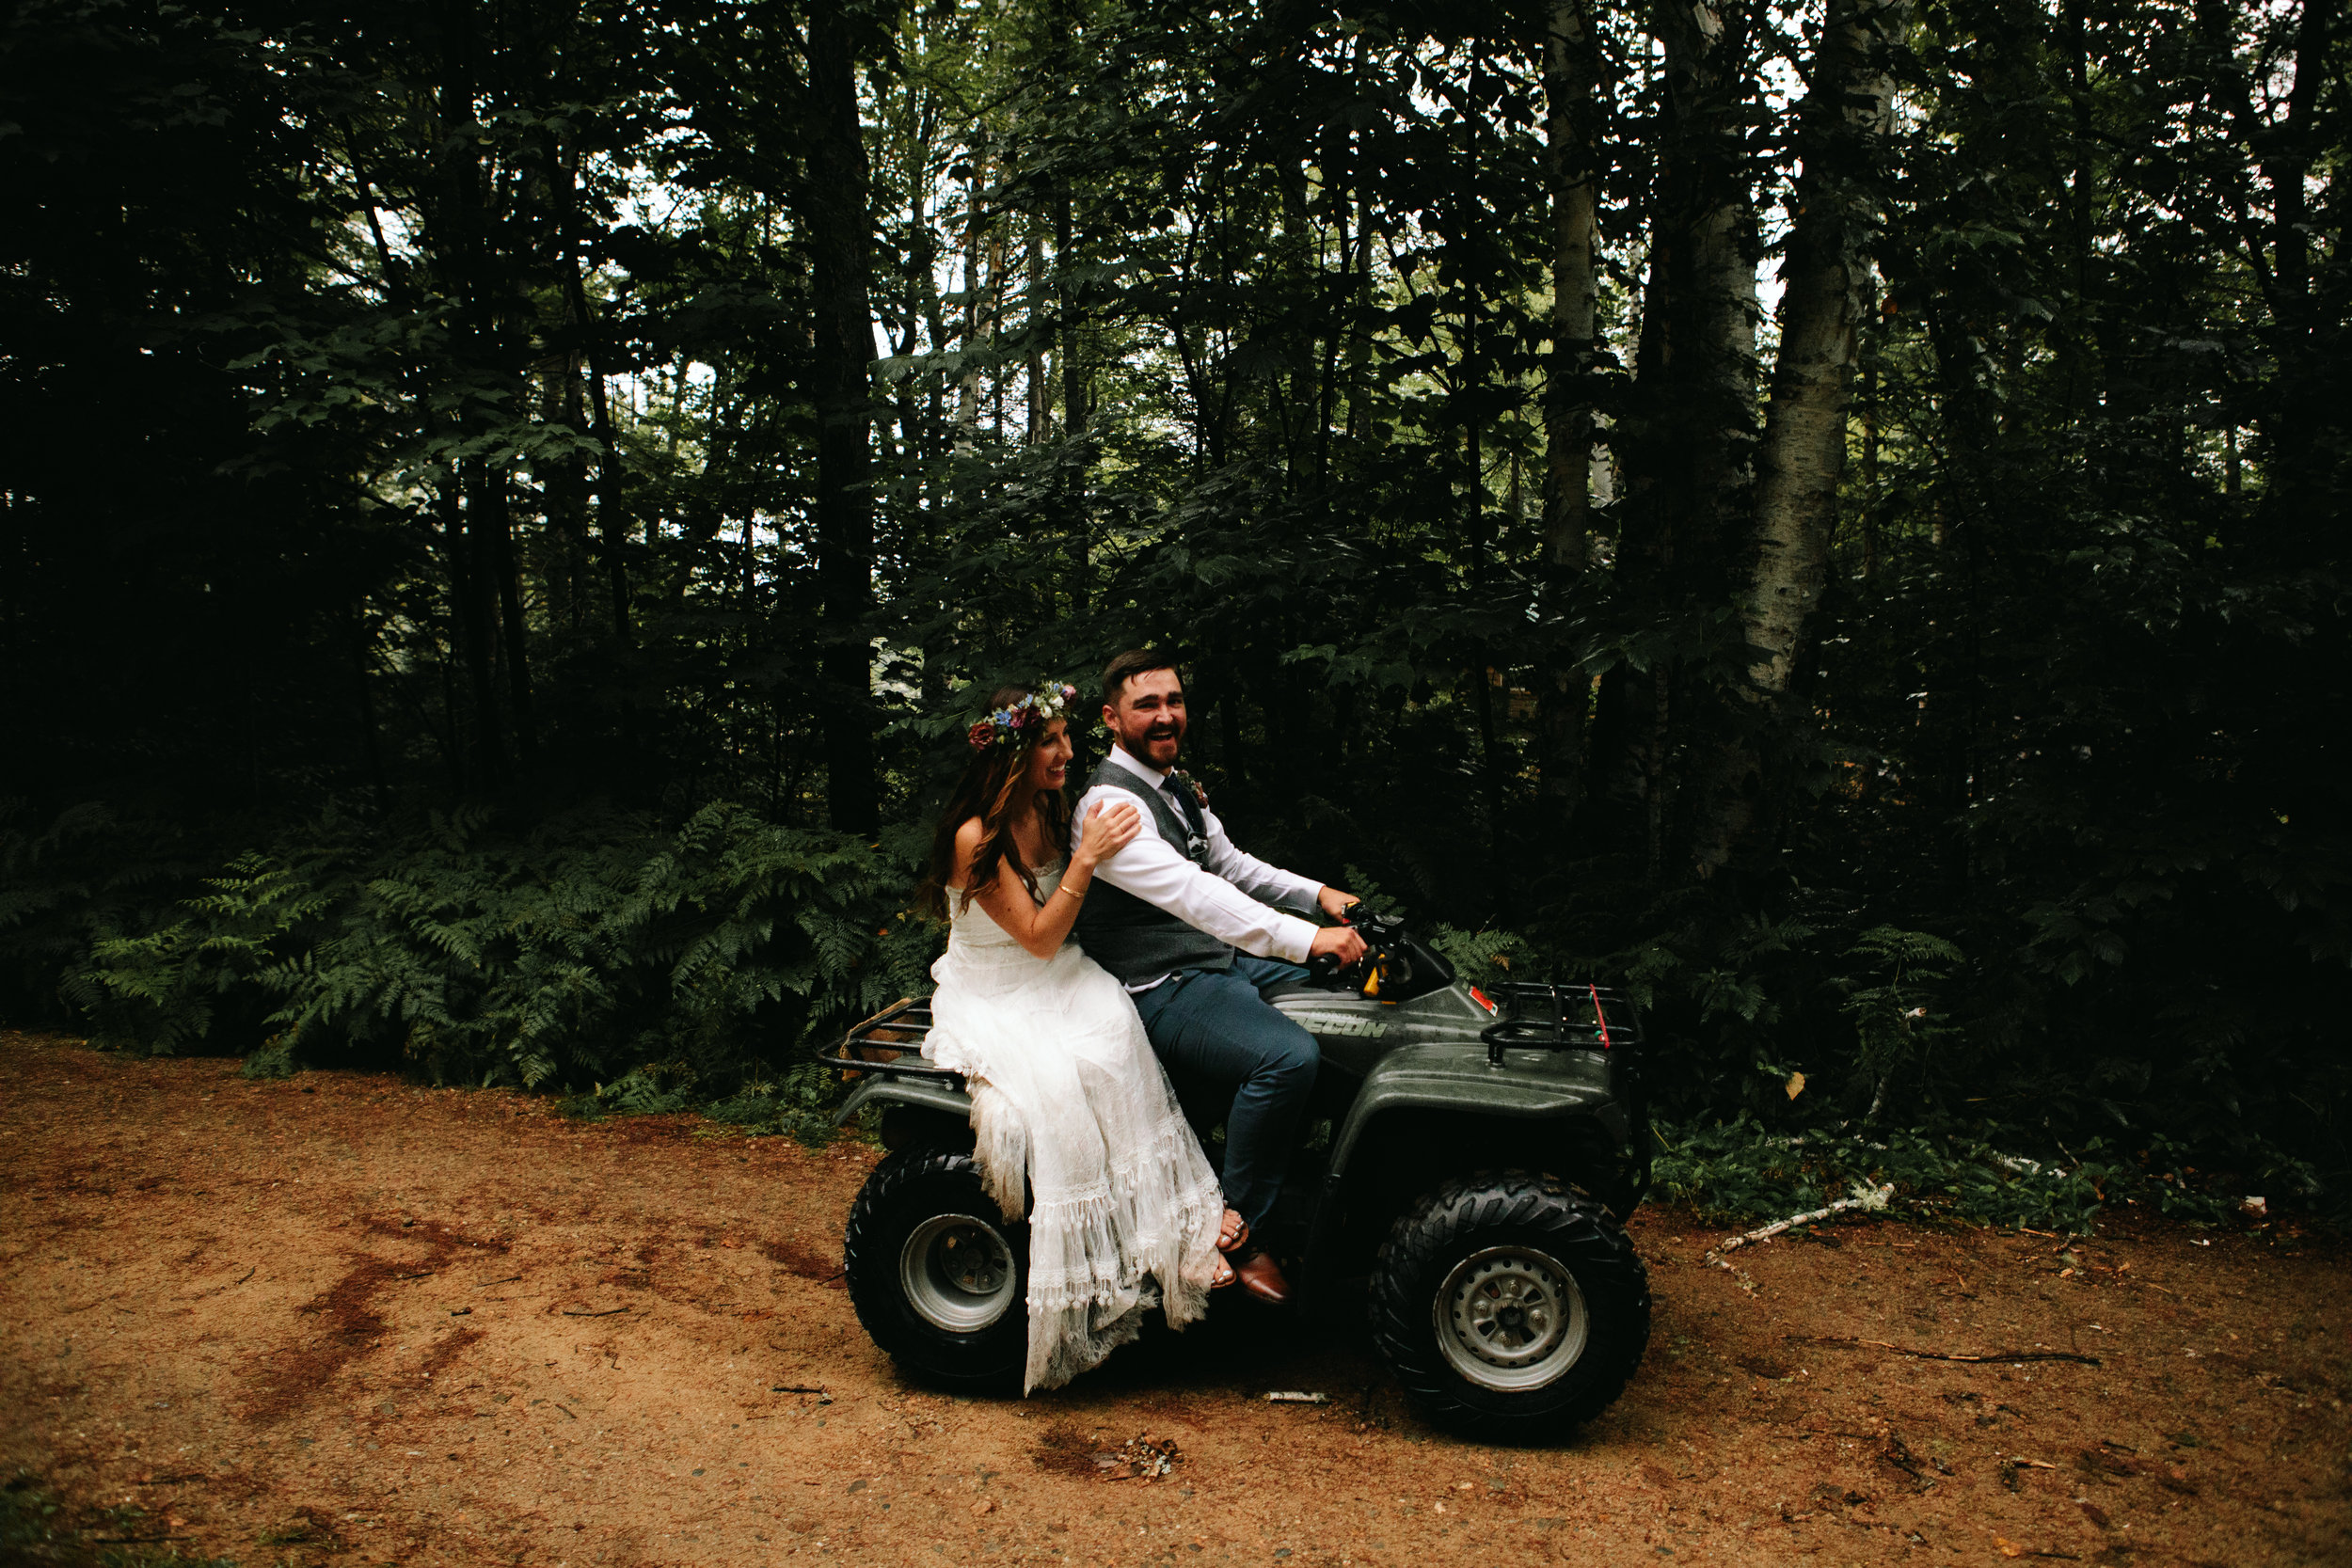 adventurous-wedding-atv